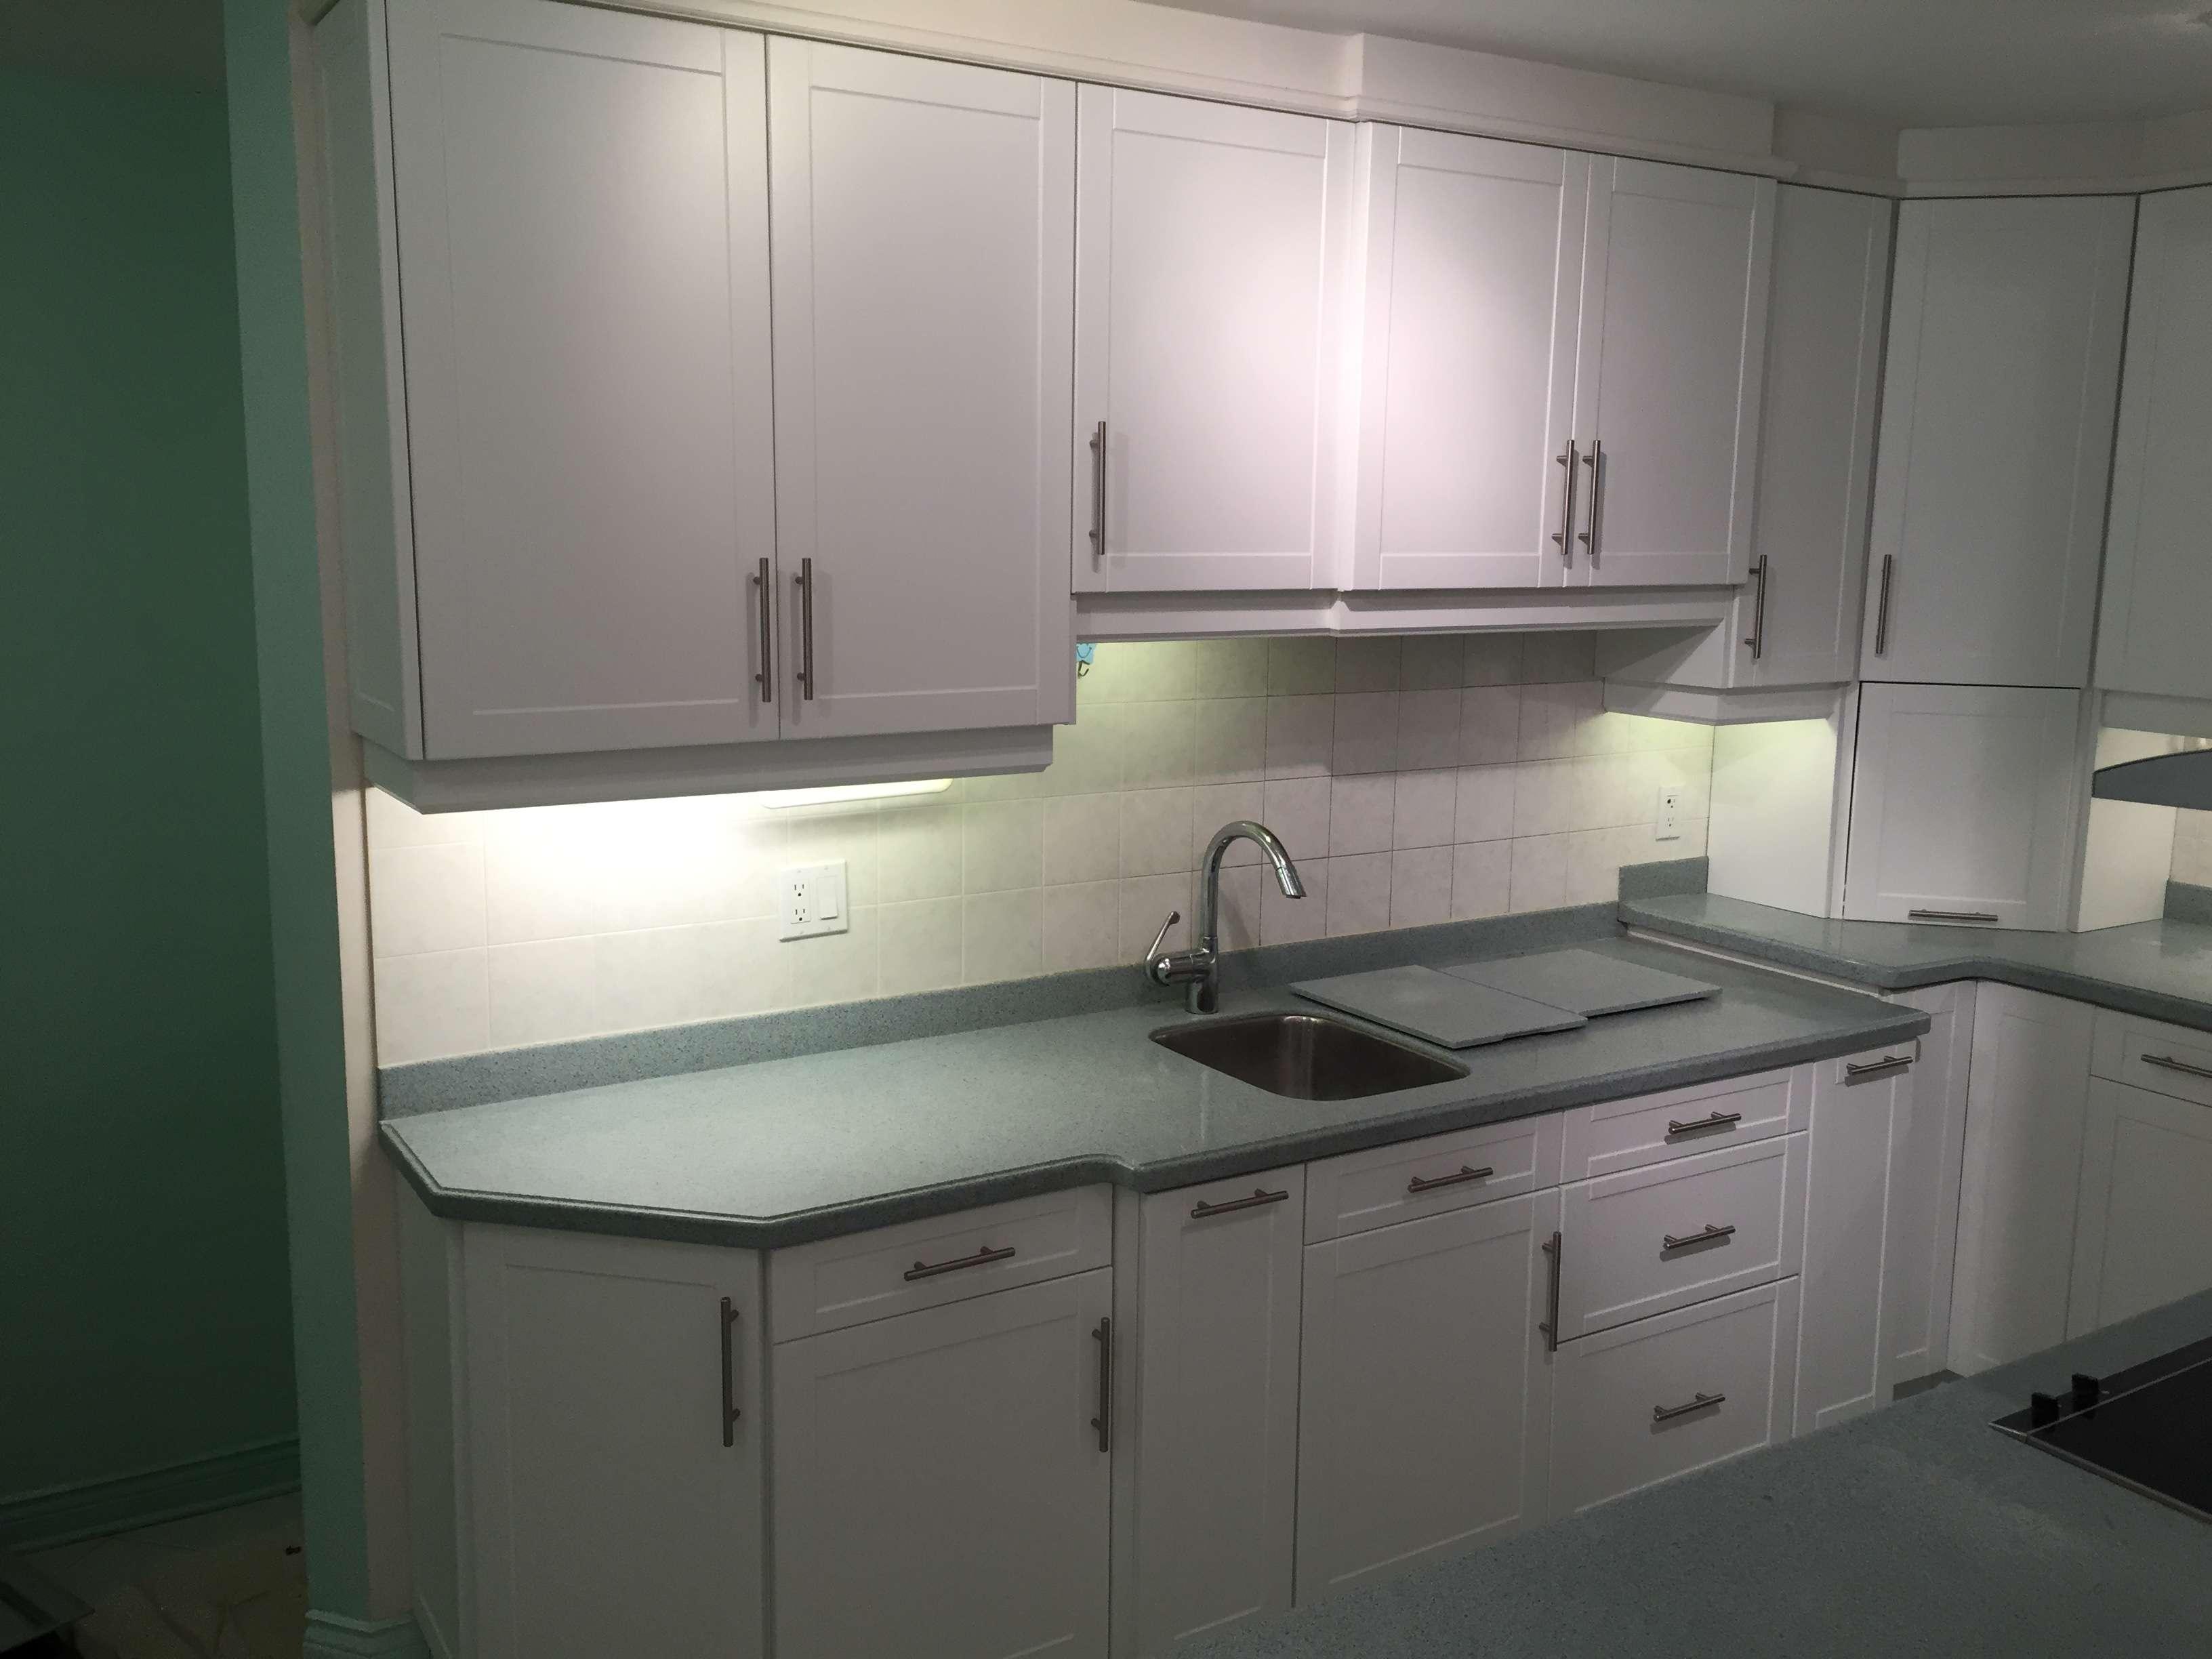 Kitchen Cabinet Refacing London Ontario